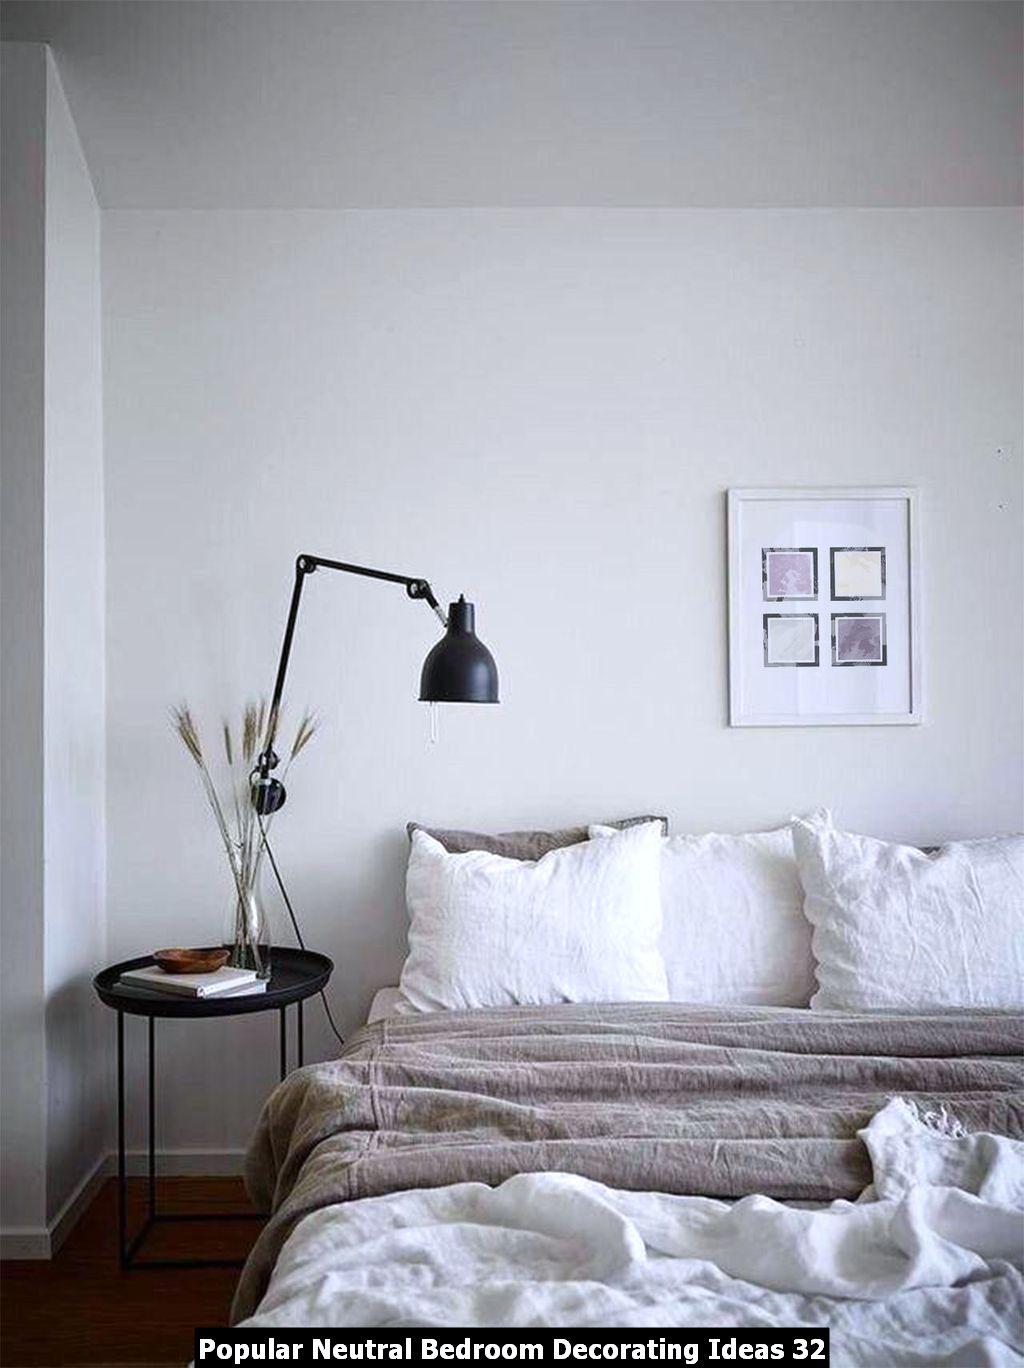 Popular Neutral Bedroom Decorating Ideas 32